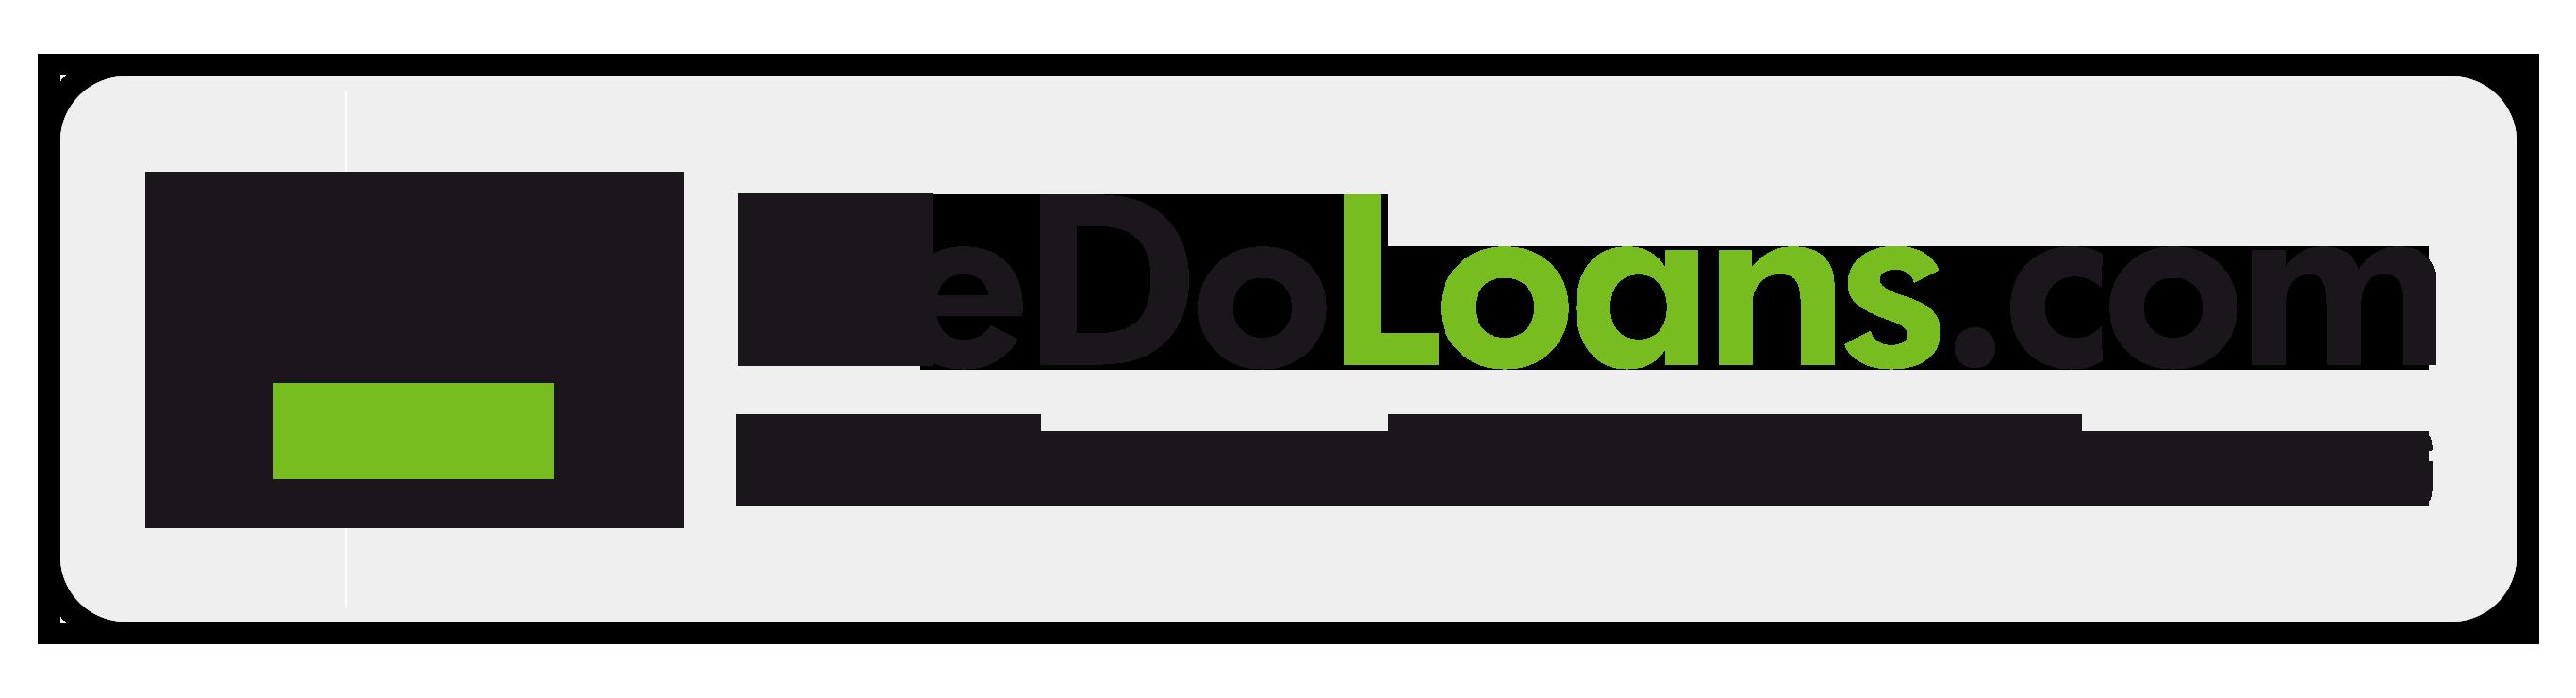 Wedoloans.com logo